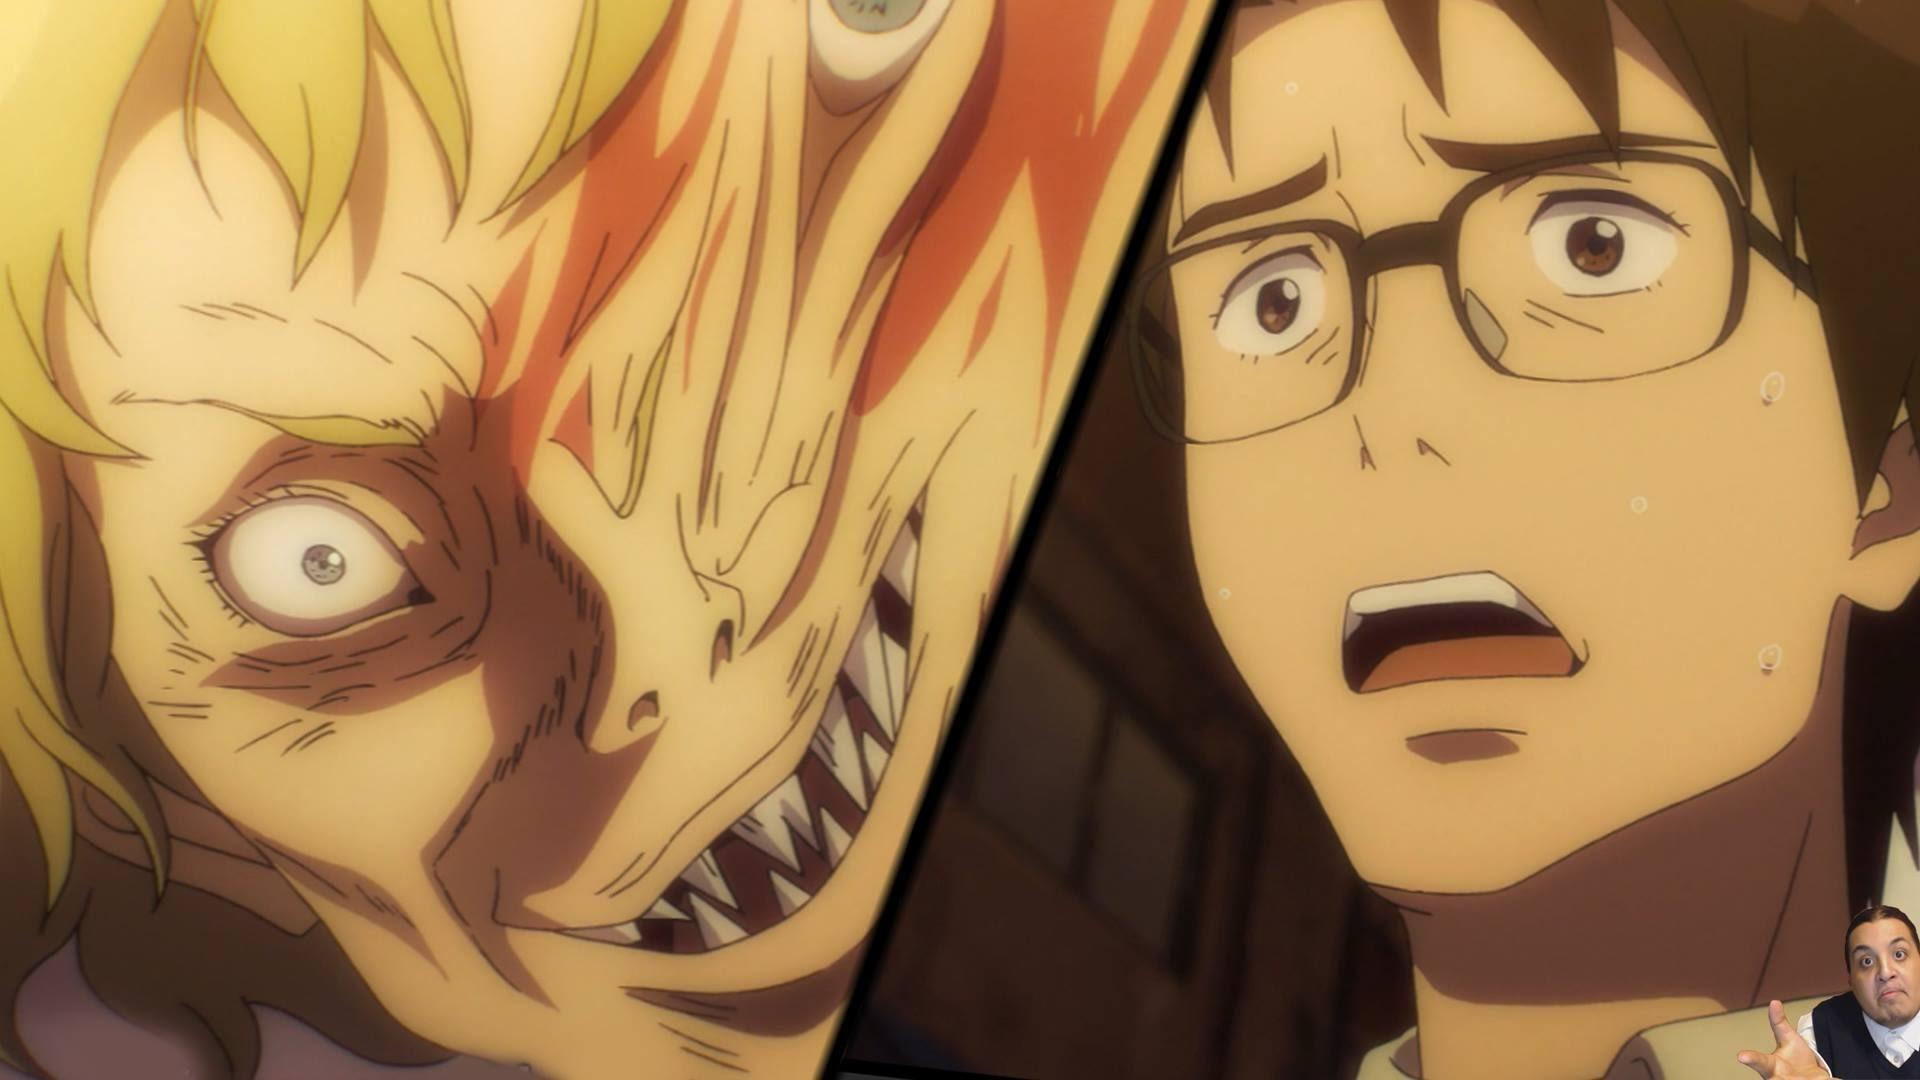 Parasyte The Maxim Episode 2 寄生獣 セイの格率 (KiseijÅ«) Anime Review — Migi &  Shinichi Already Beasting!!! – YouTube